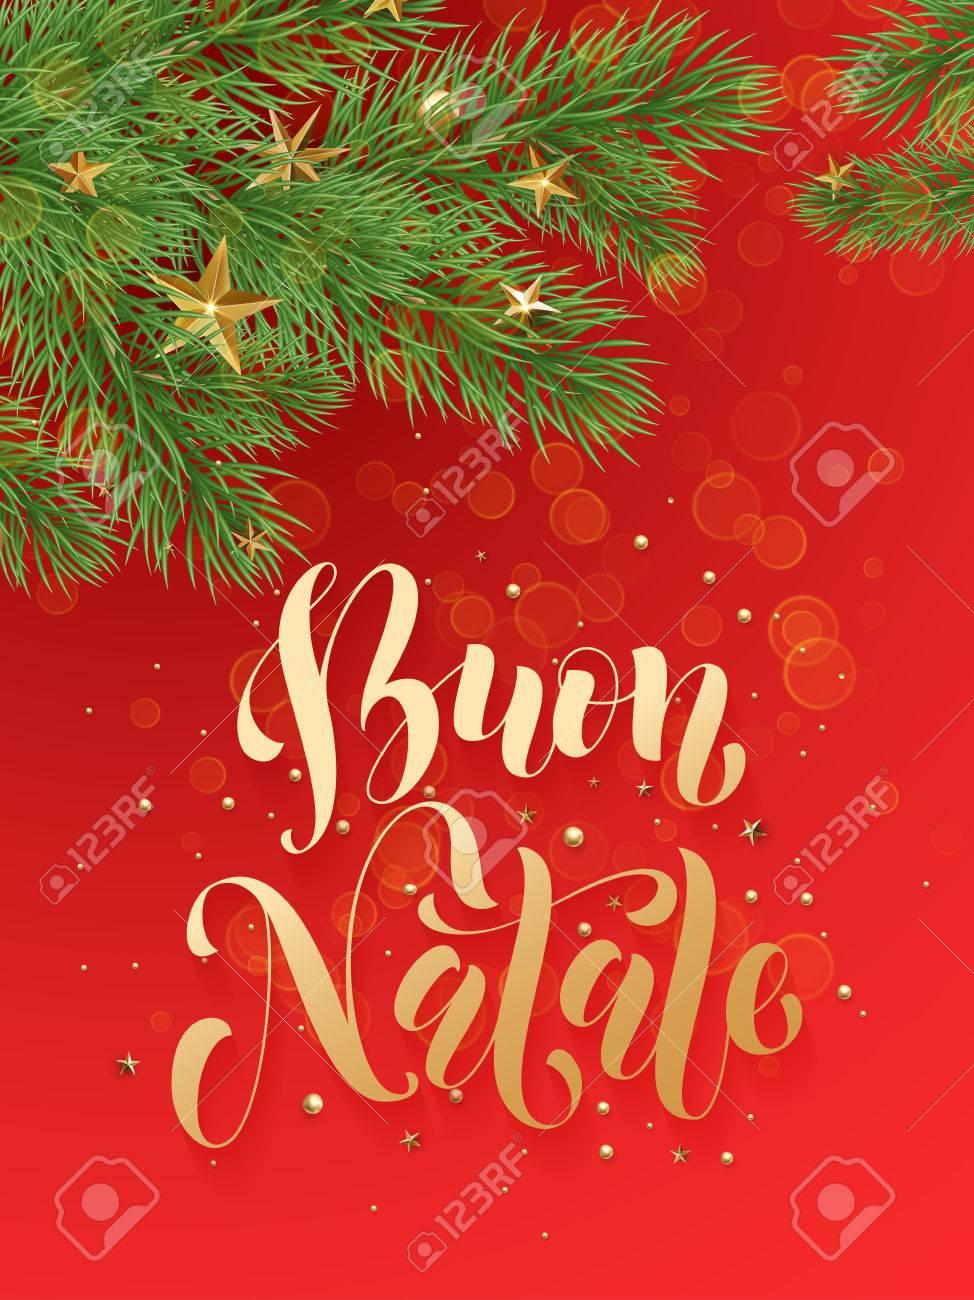 Buon Natale Italia.Buon Natale Italian Merry Christmas Background Decoration Ornaments Royalty Free Cliparts Vectors And Stock Illustration Image 66973217